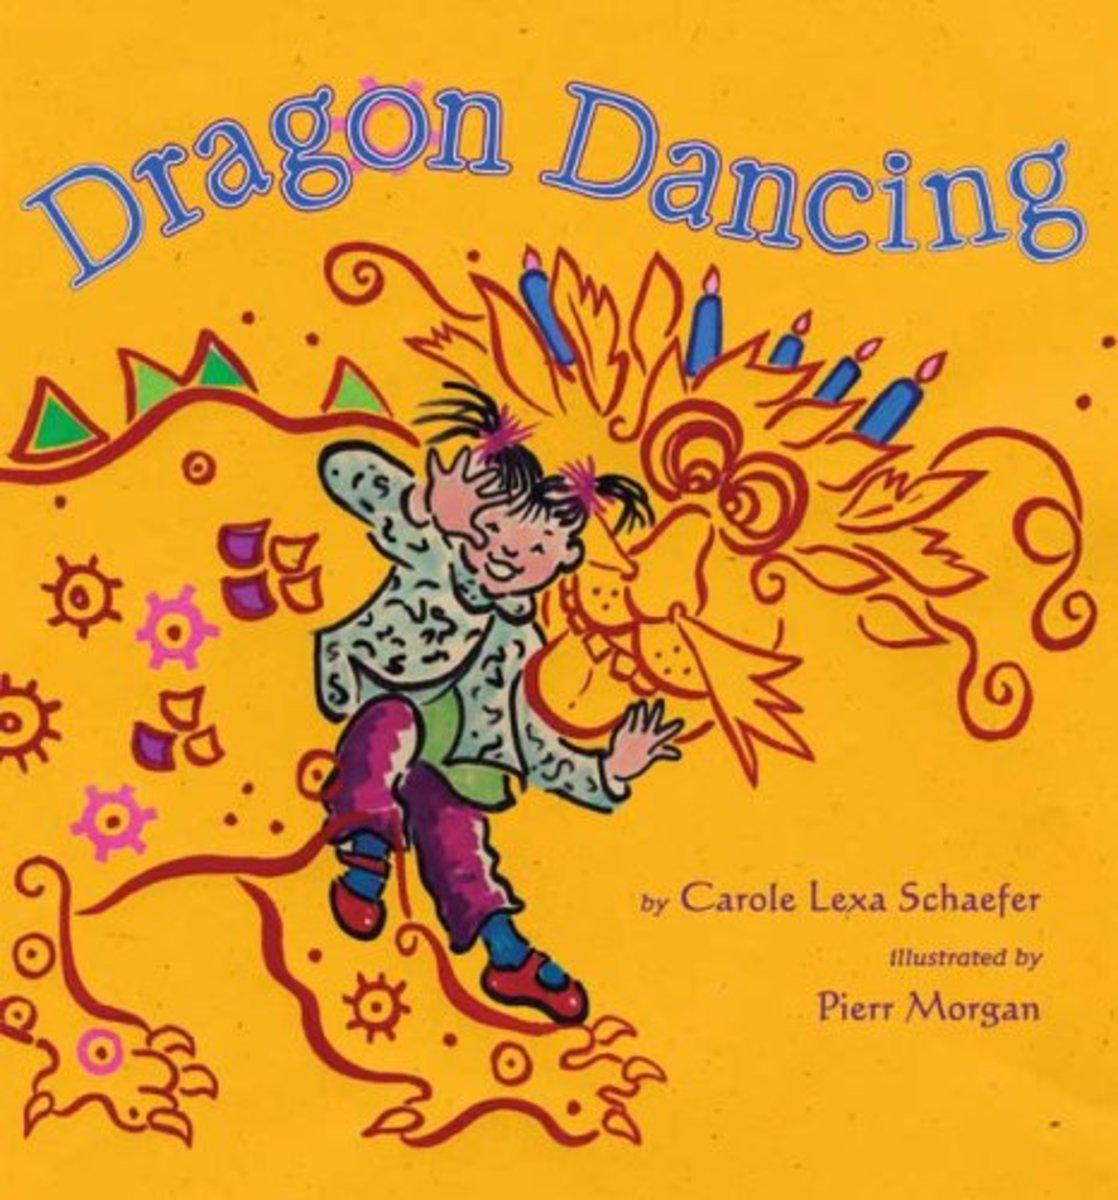 Dragon Dancing by Carole Lexa Schaefer